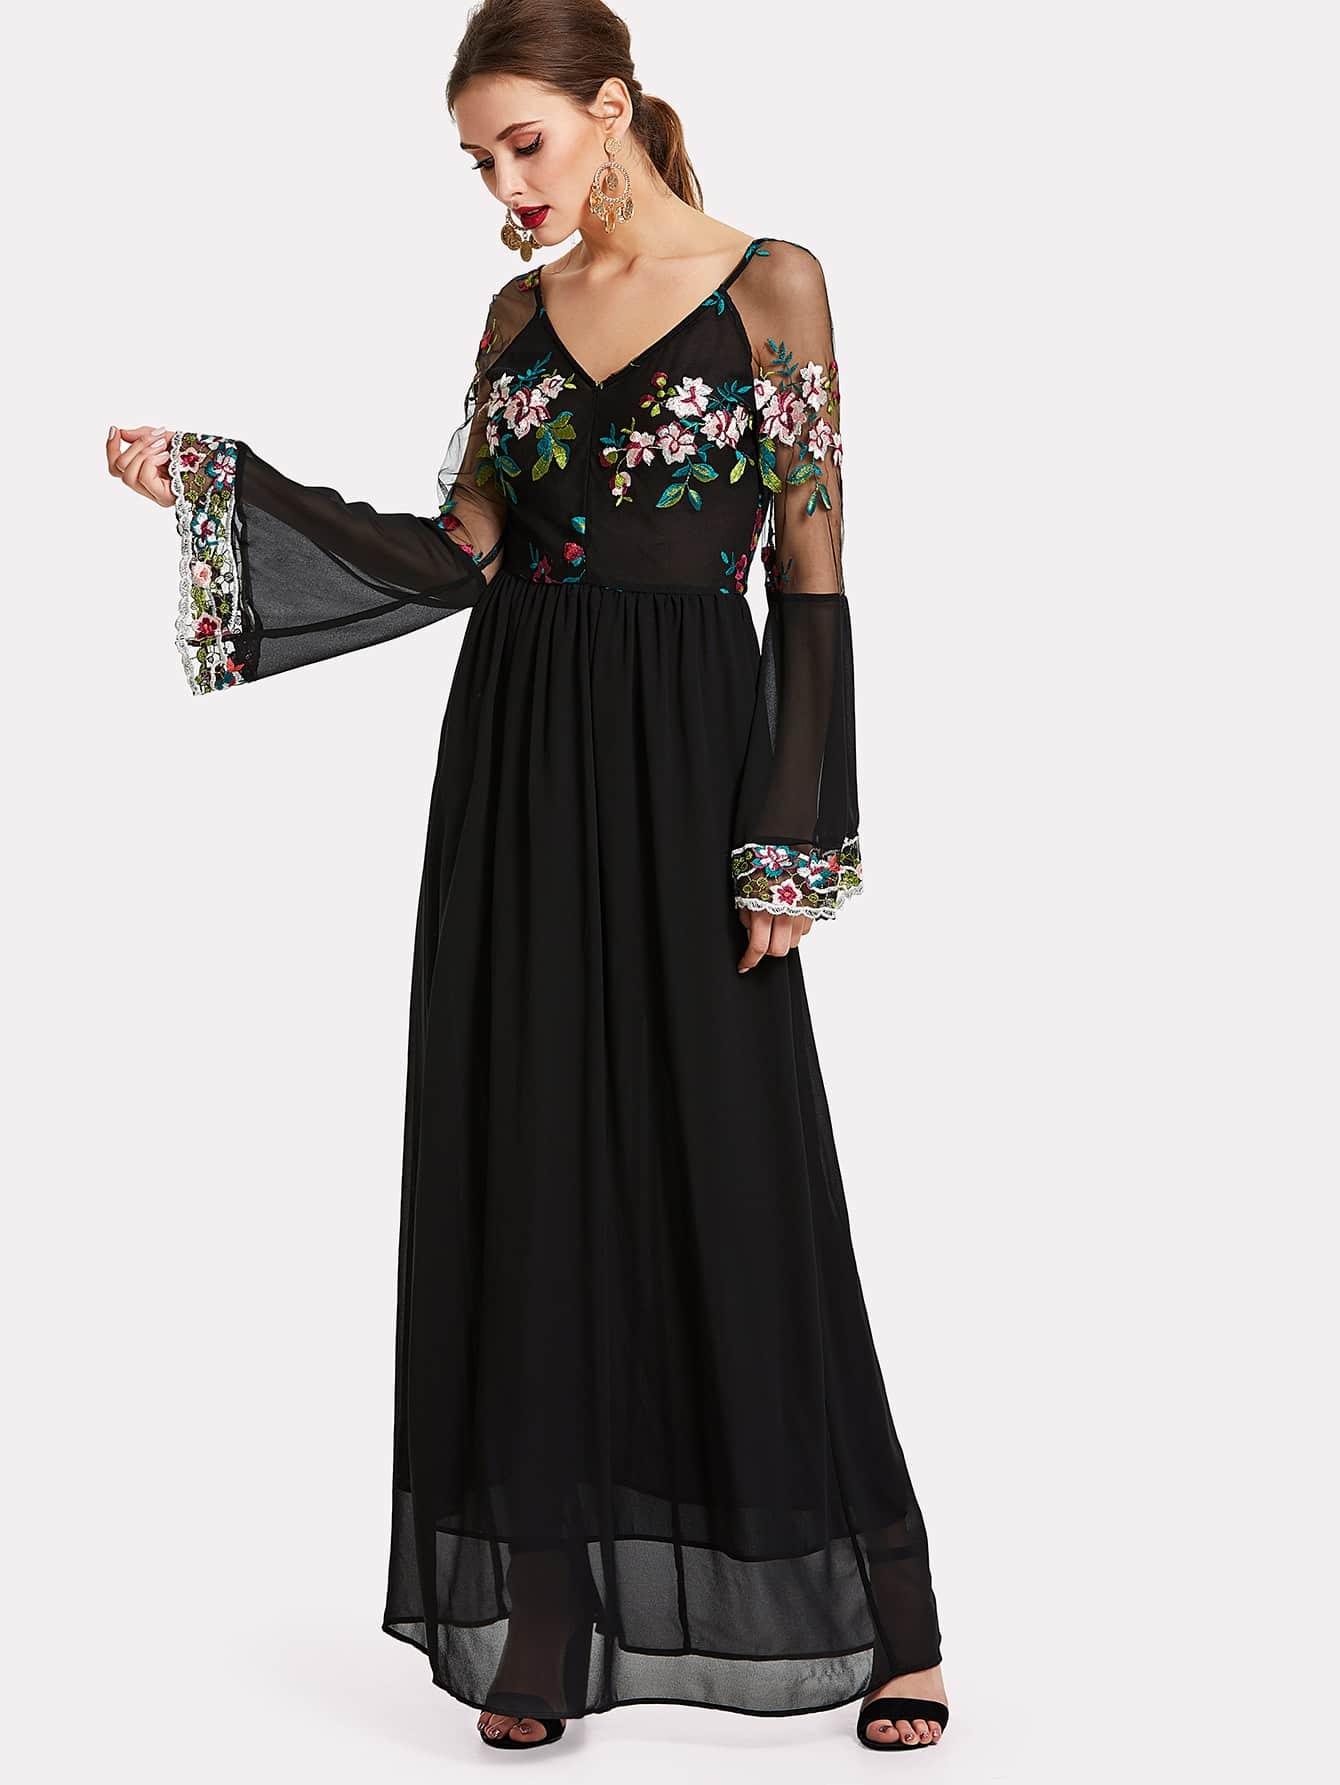 Trumpet Sleeve Embroidered Mesh Bodice Dress mesh panel sleeve dress